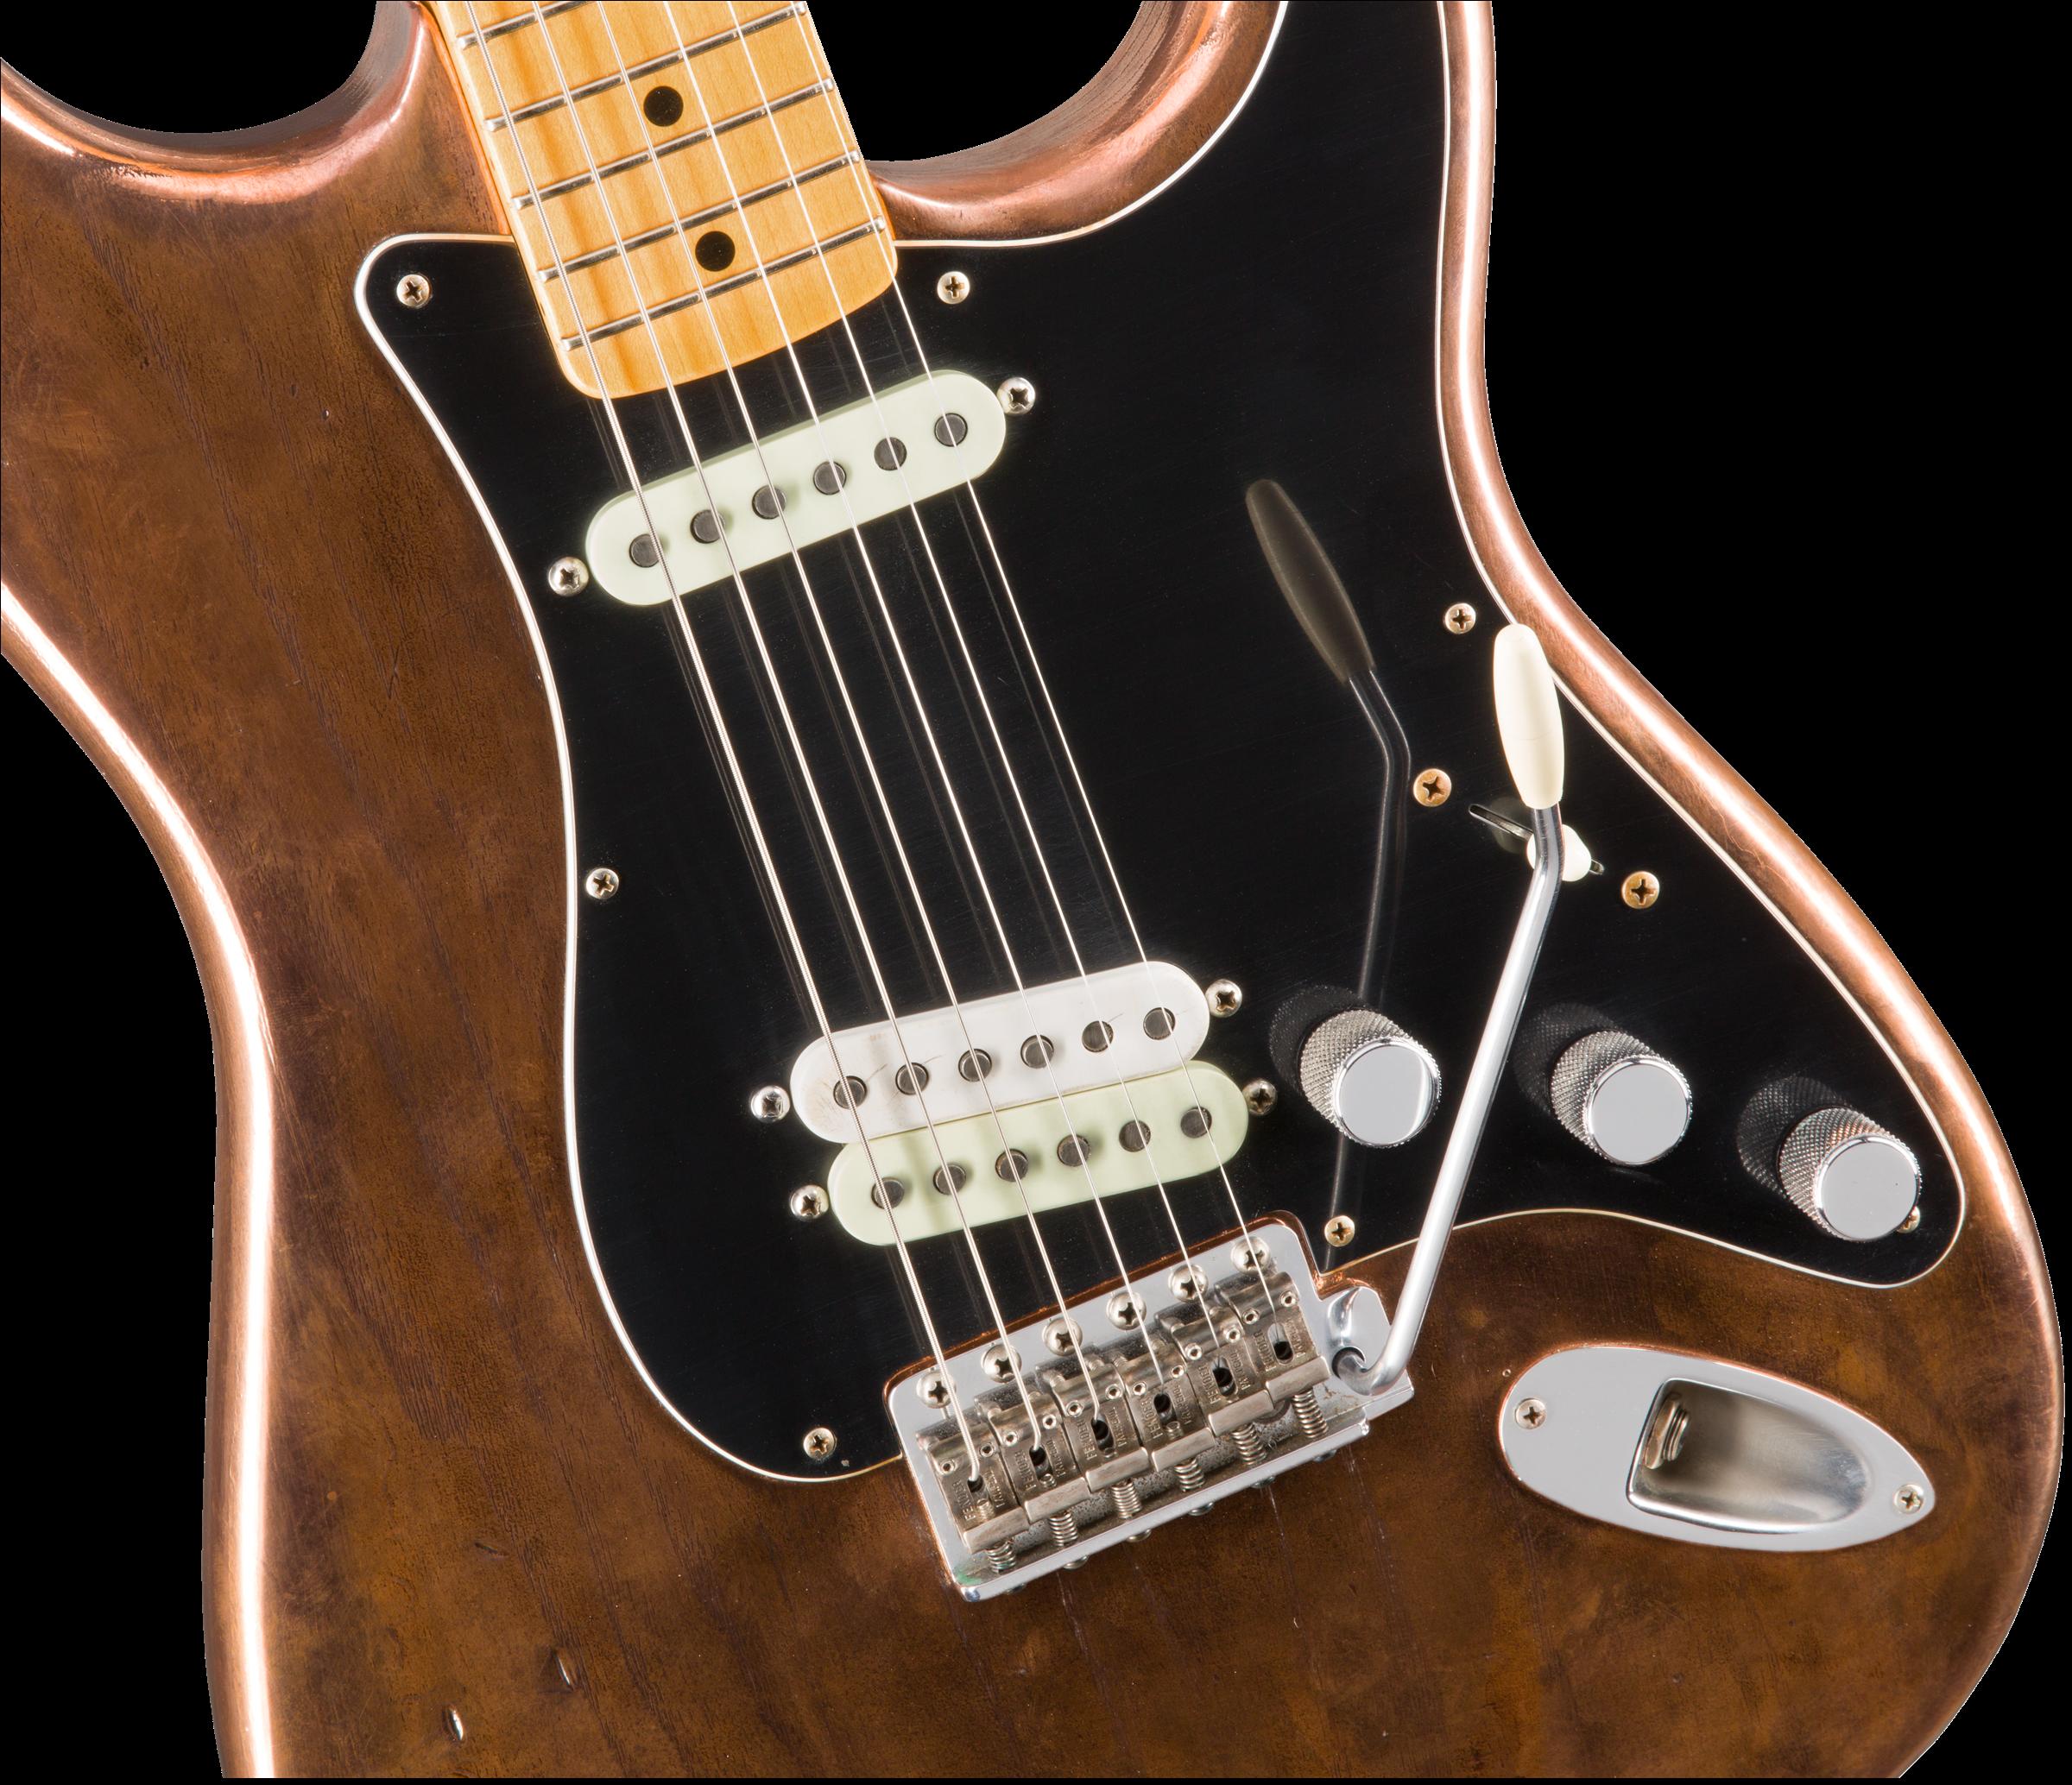 Limited Edition Robbie Robertson Last Waltz Stratocaster Artist Fender American Special Hss Strat Wiring Diagram